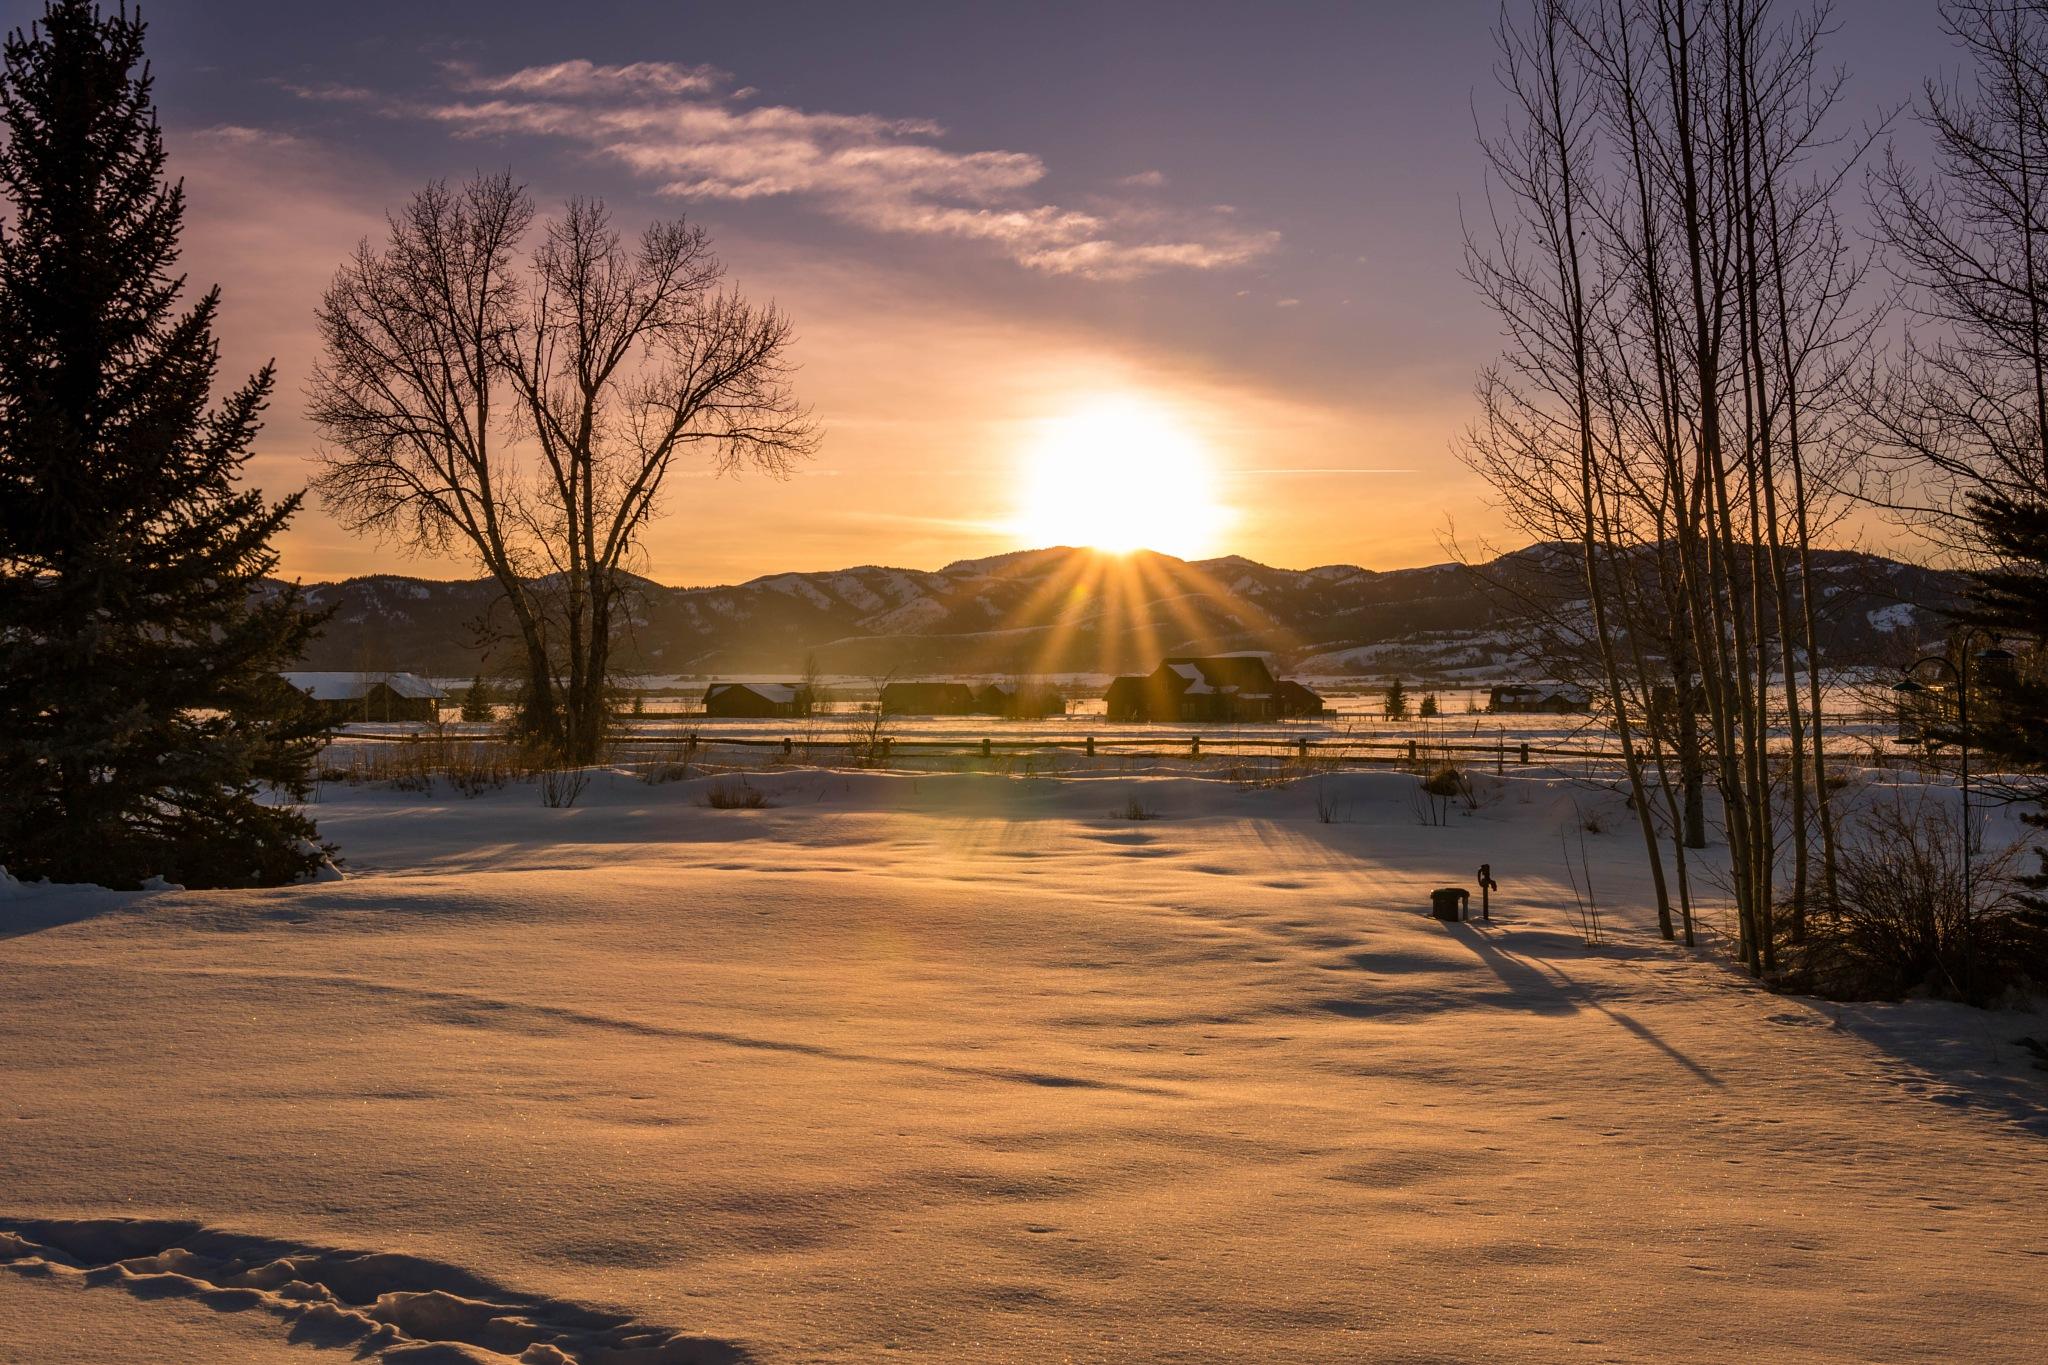 Sun Kissing Peak by drchad480